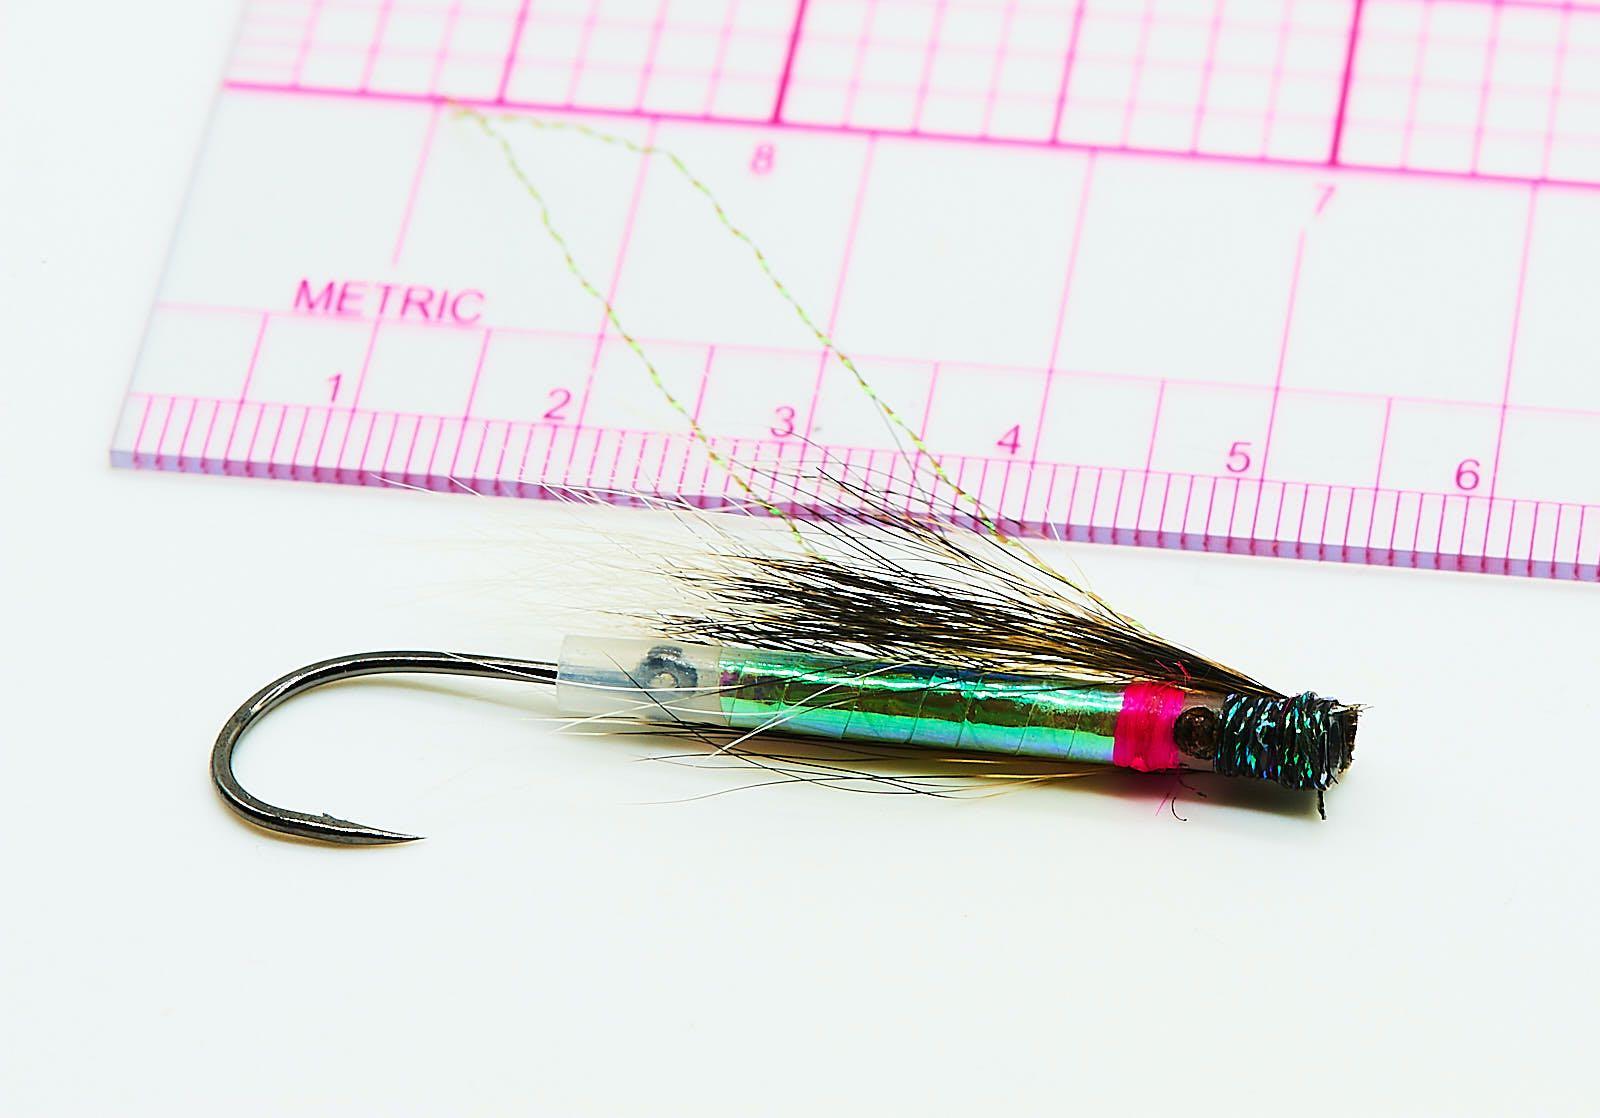 V-Fly Hitch Pearl - medium # 4